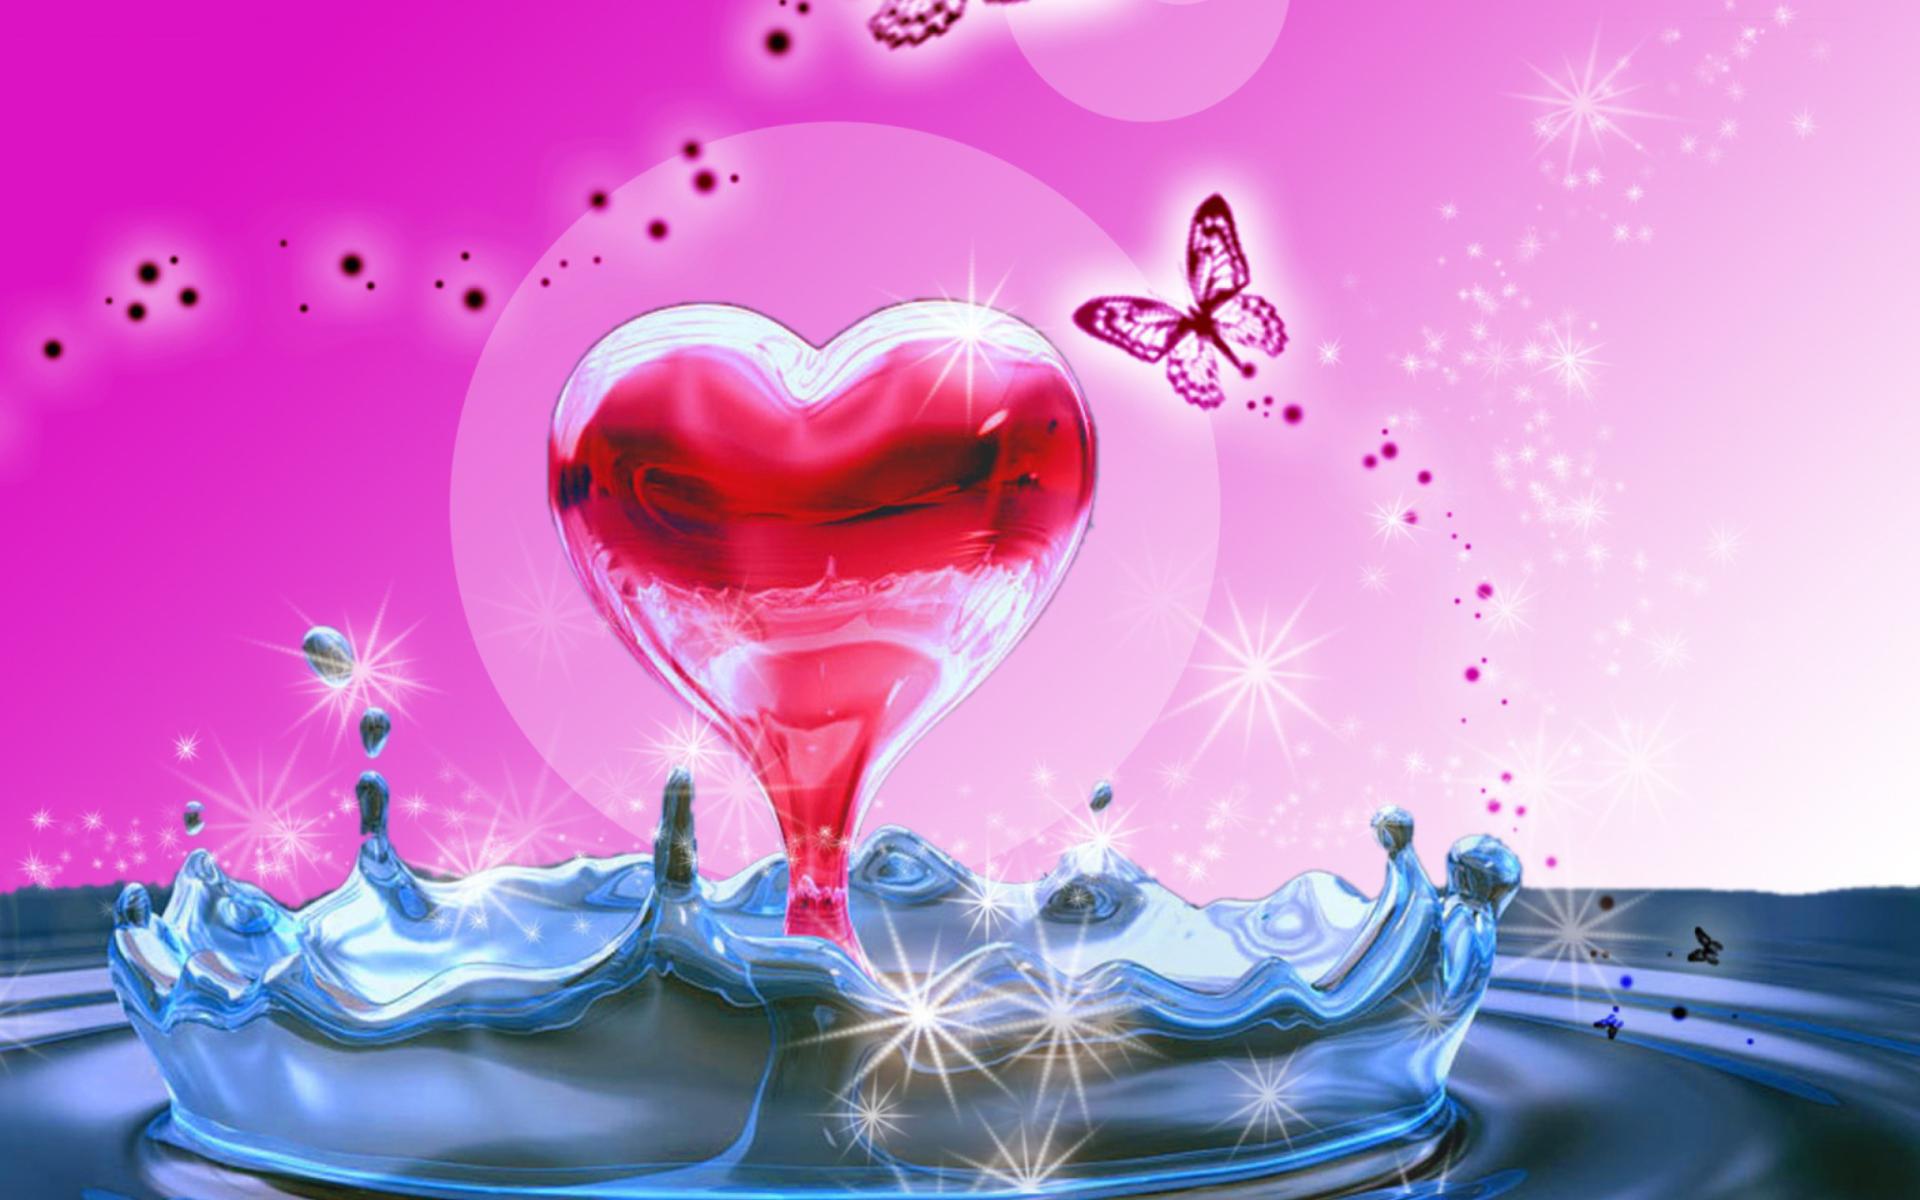 Love Wallpapers Hd, Amor Fondos De Pantalla, Love 3D